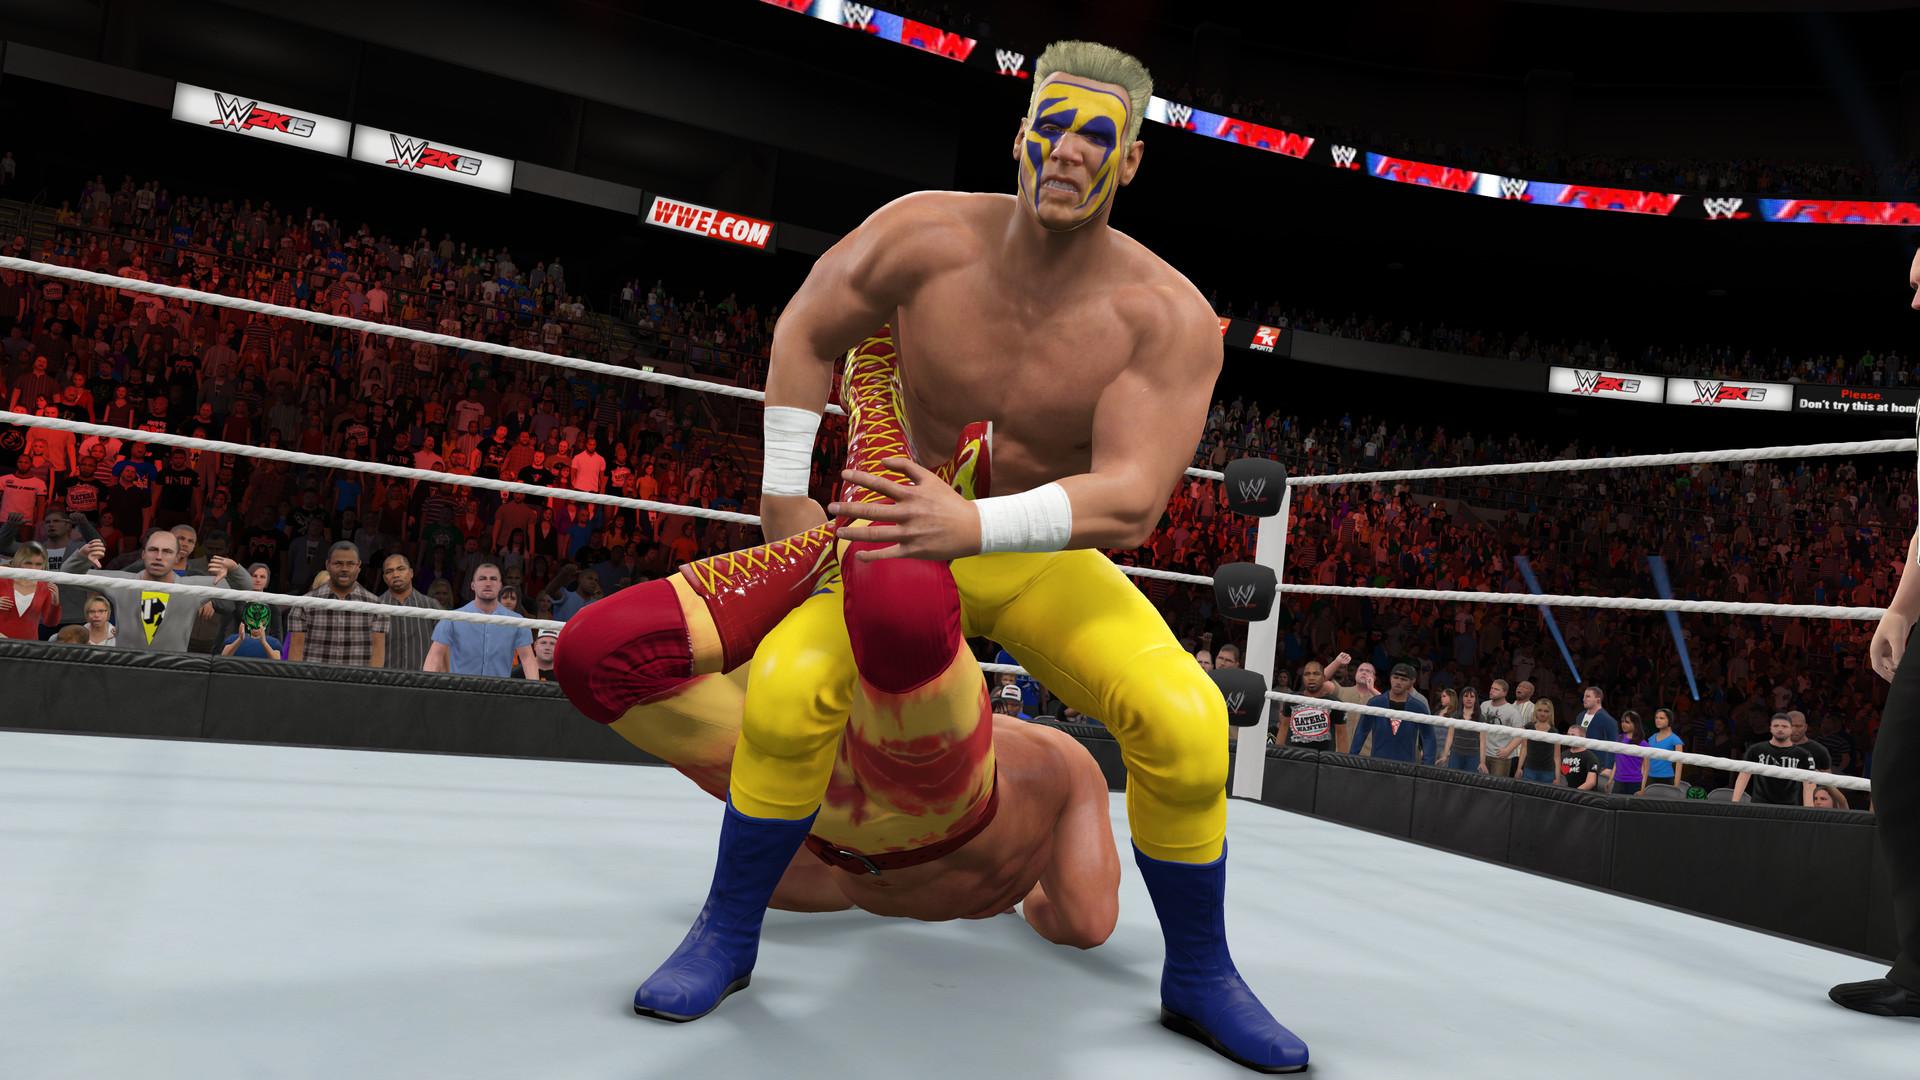 WWE 2K15 ESPAÑOL Full PC + DLC Pack Addon (RELOADED) + REPACK 5 DVD5 (JPW) 5